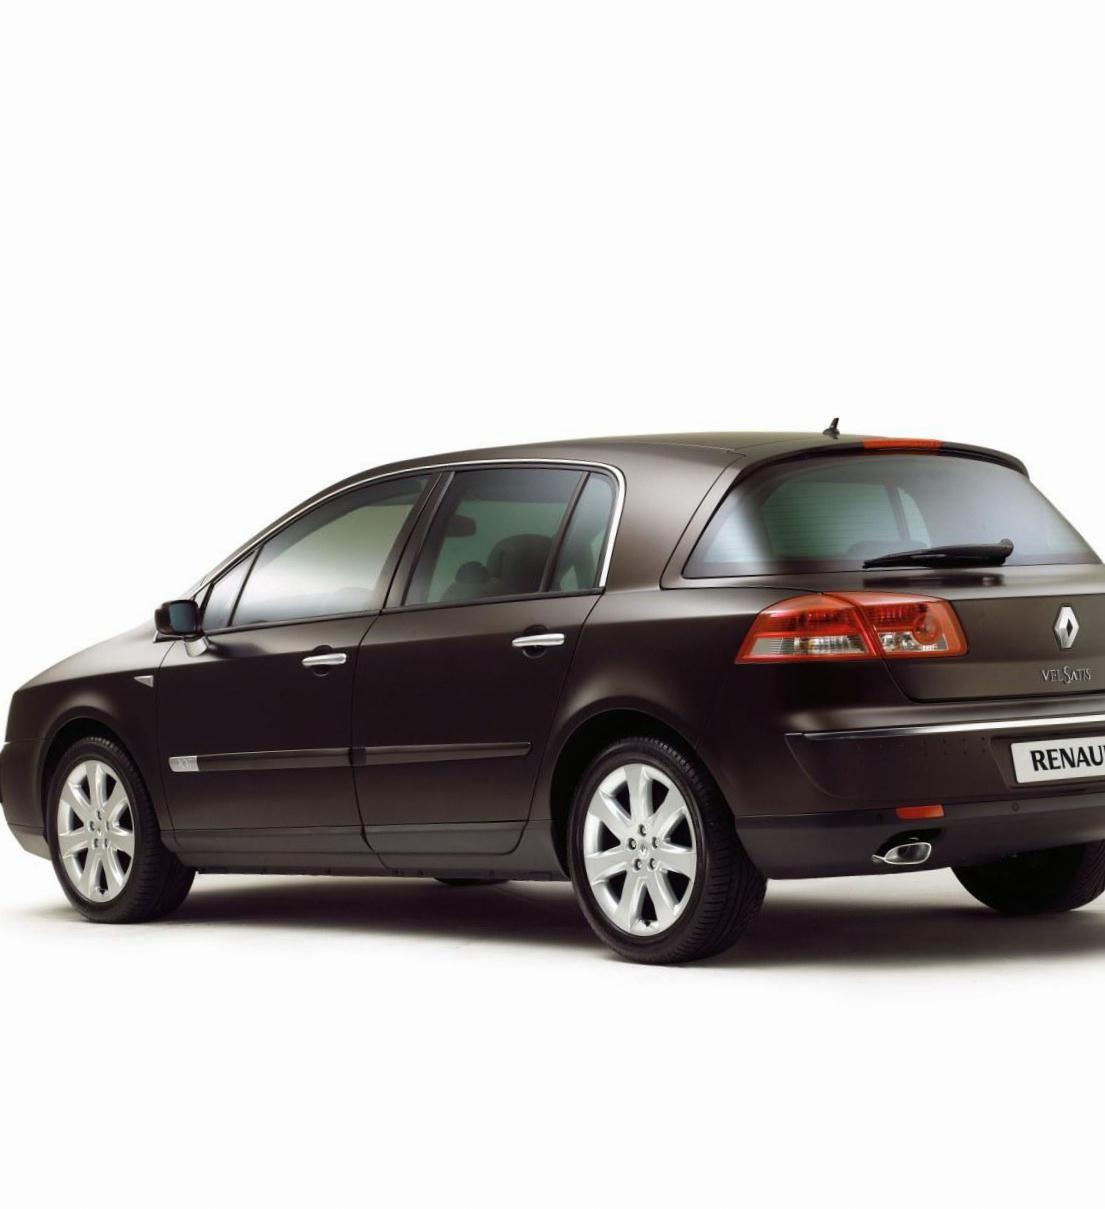 Renault Vel Satis Wiring Diagram Schematic Diagrams For Sale Autotras Com Auto Pinterest